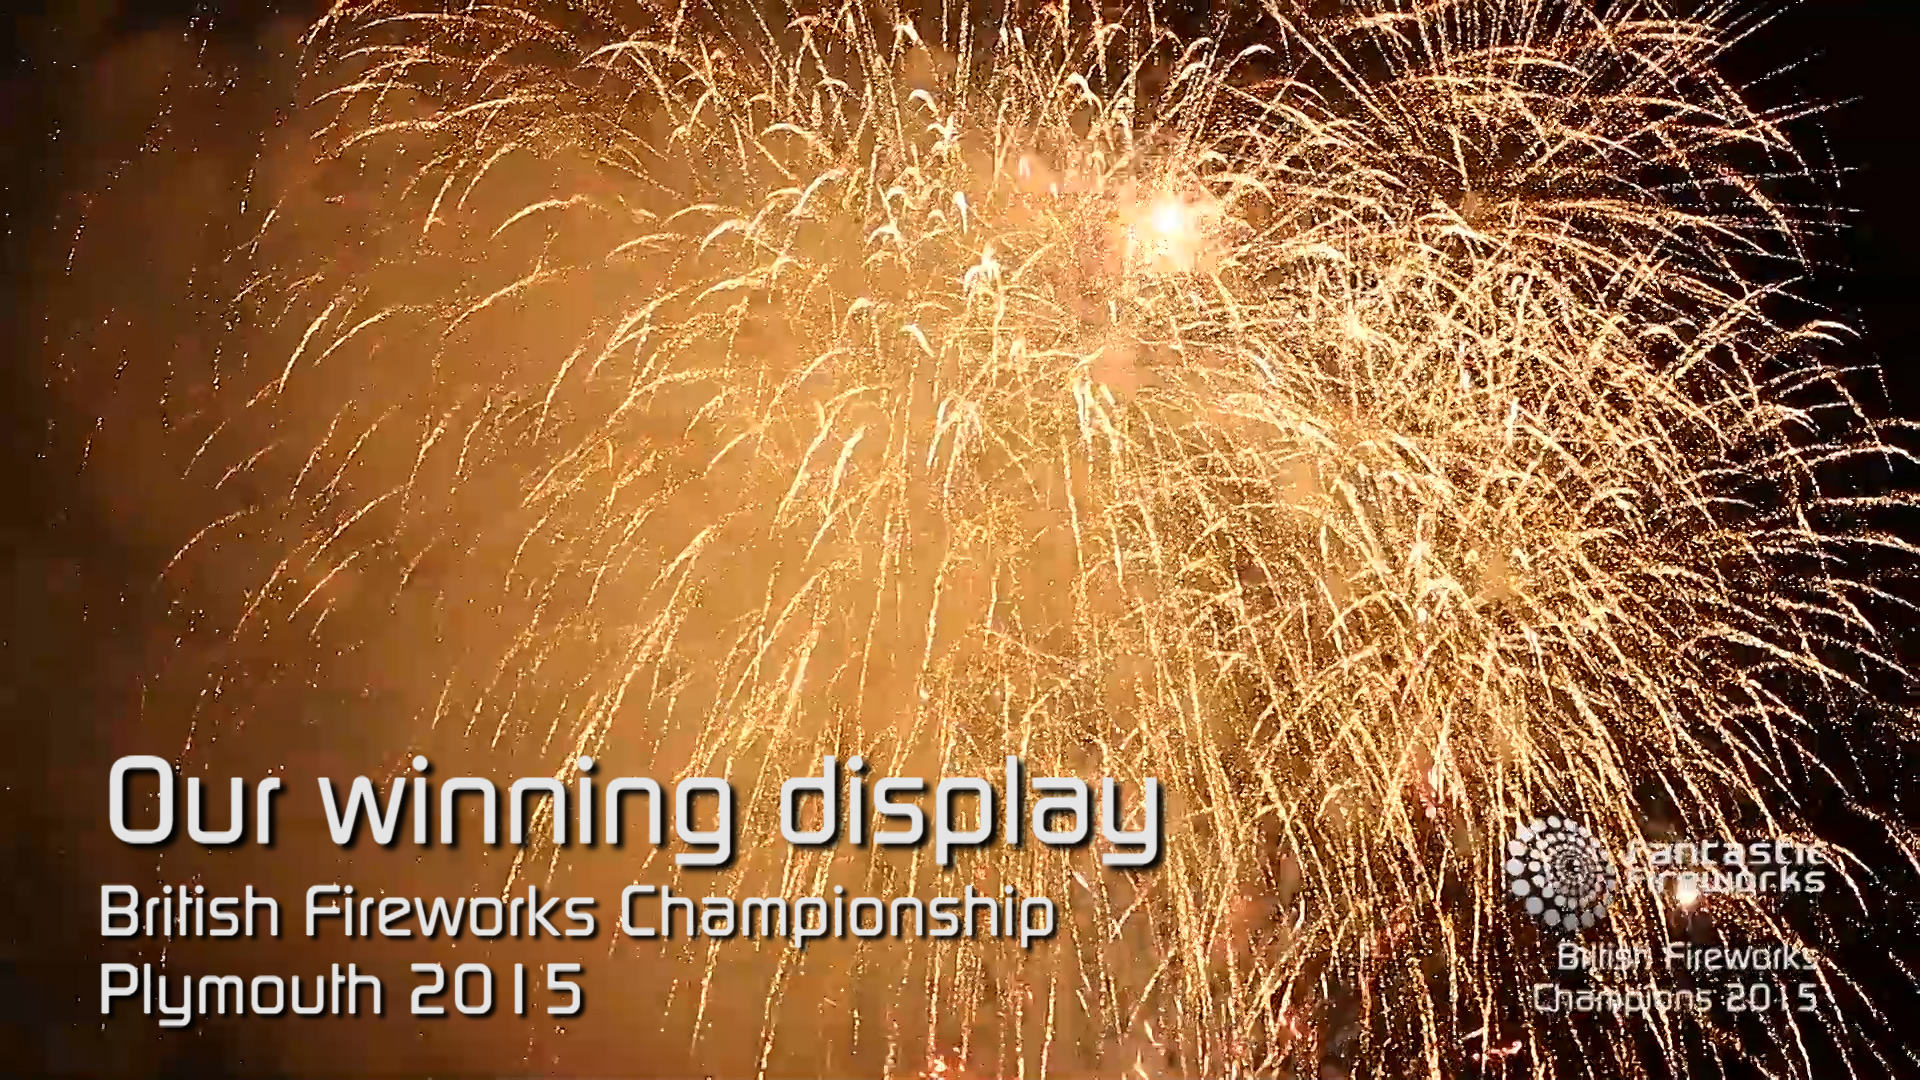 Professional Fireworks Displays | British Fireworks Championship